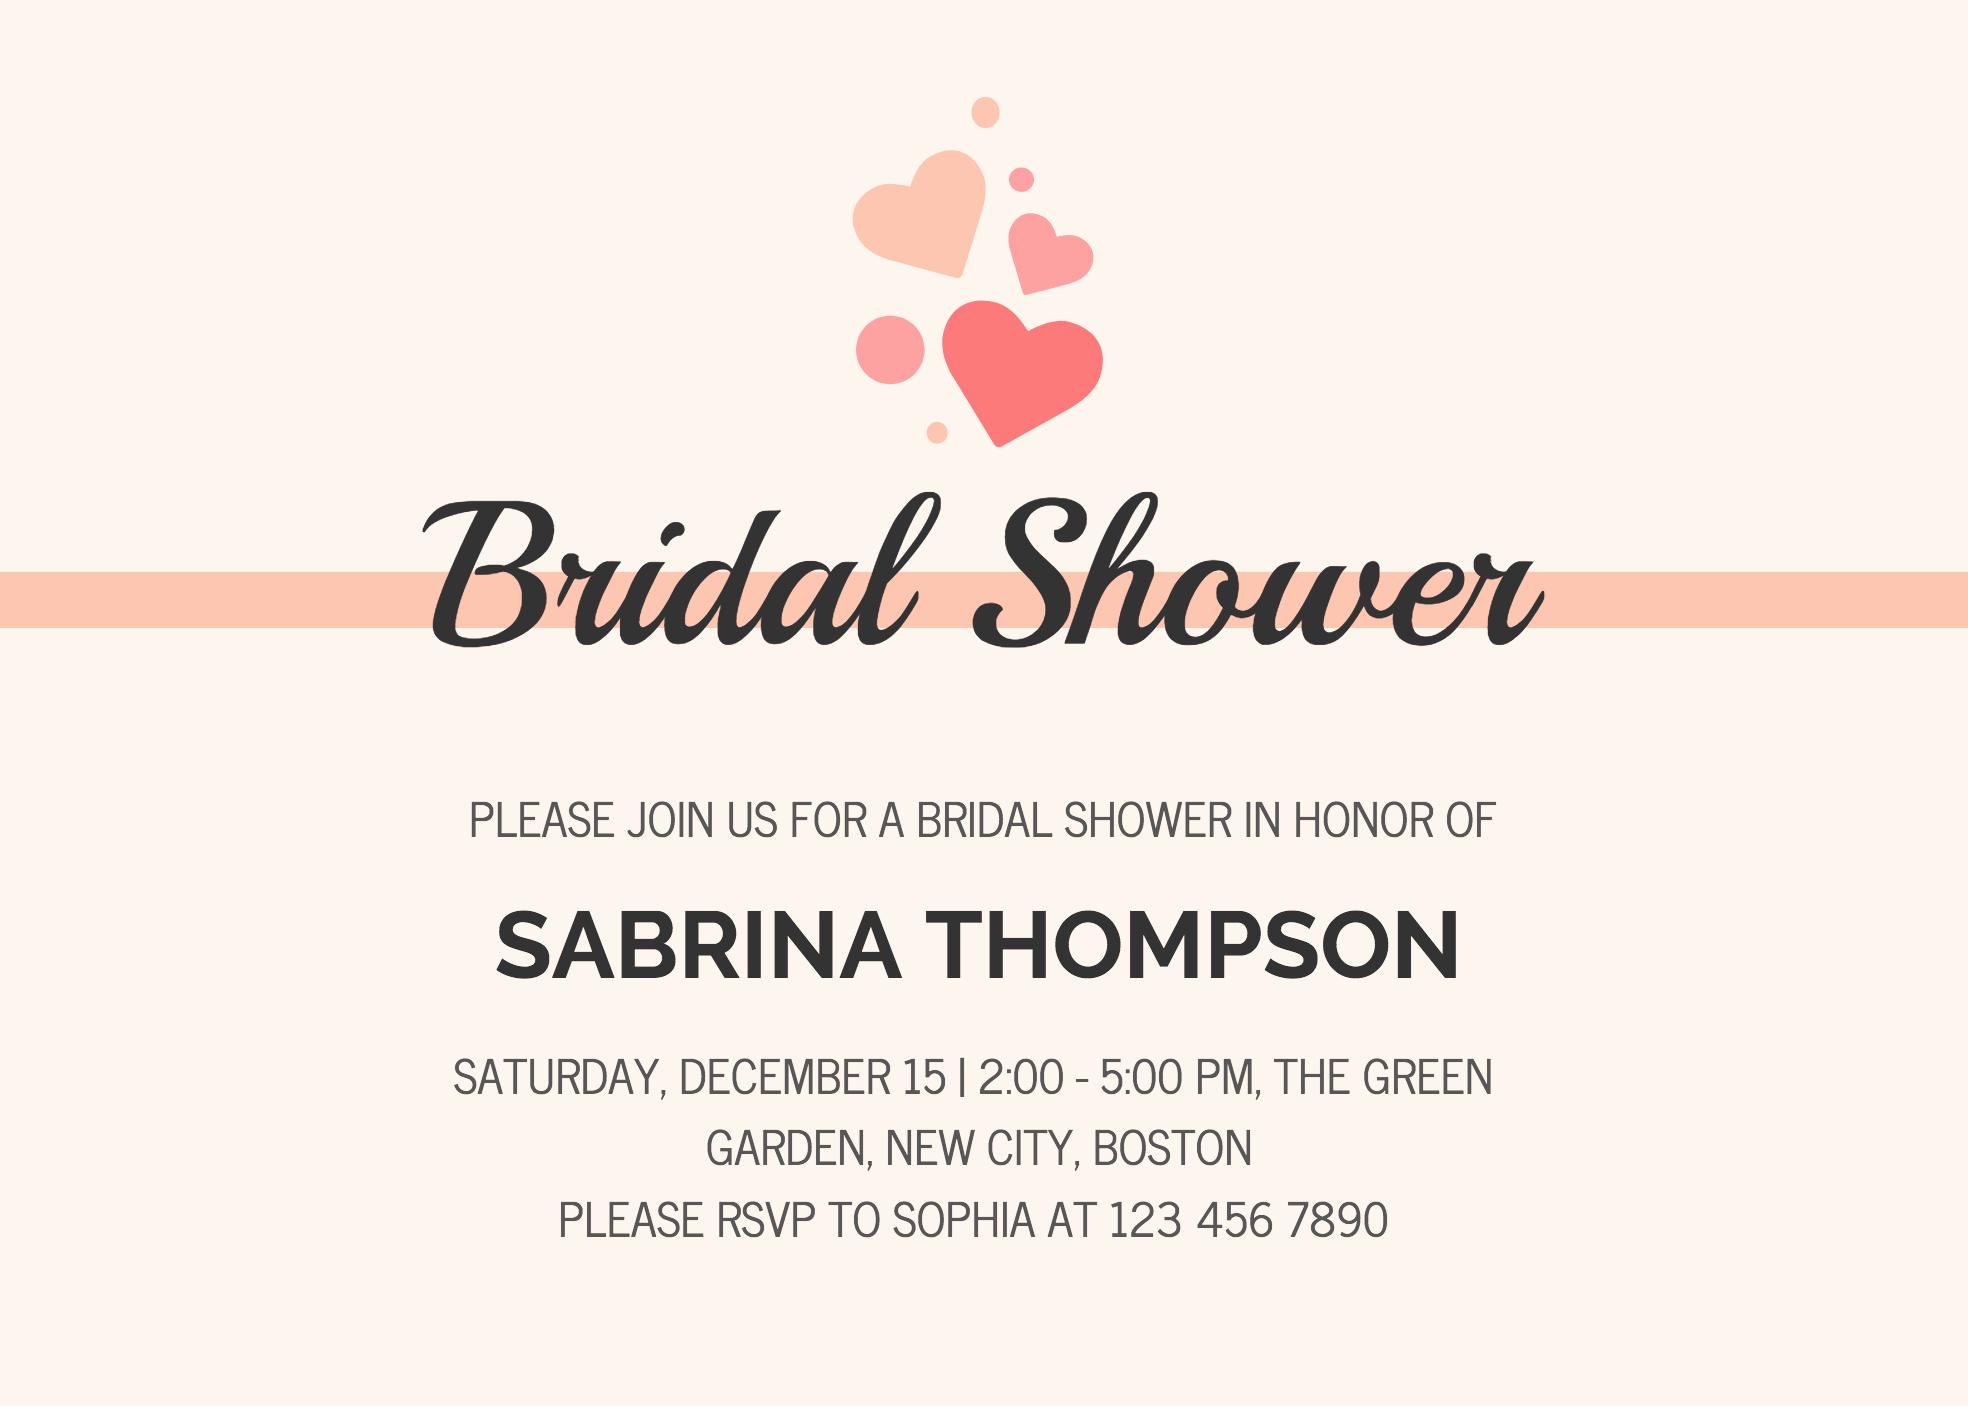 Bridal Shower Invitation Template Fresh 19 Diy Bridal Shower and Wedding Invitation Templates